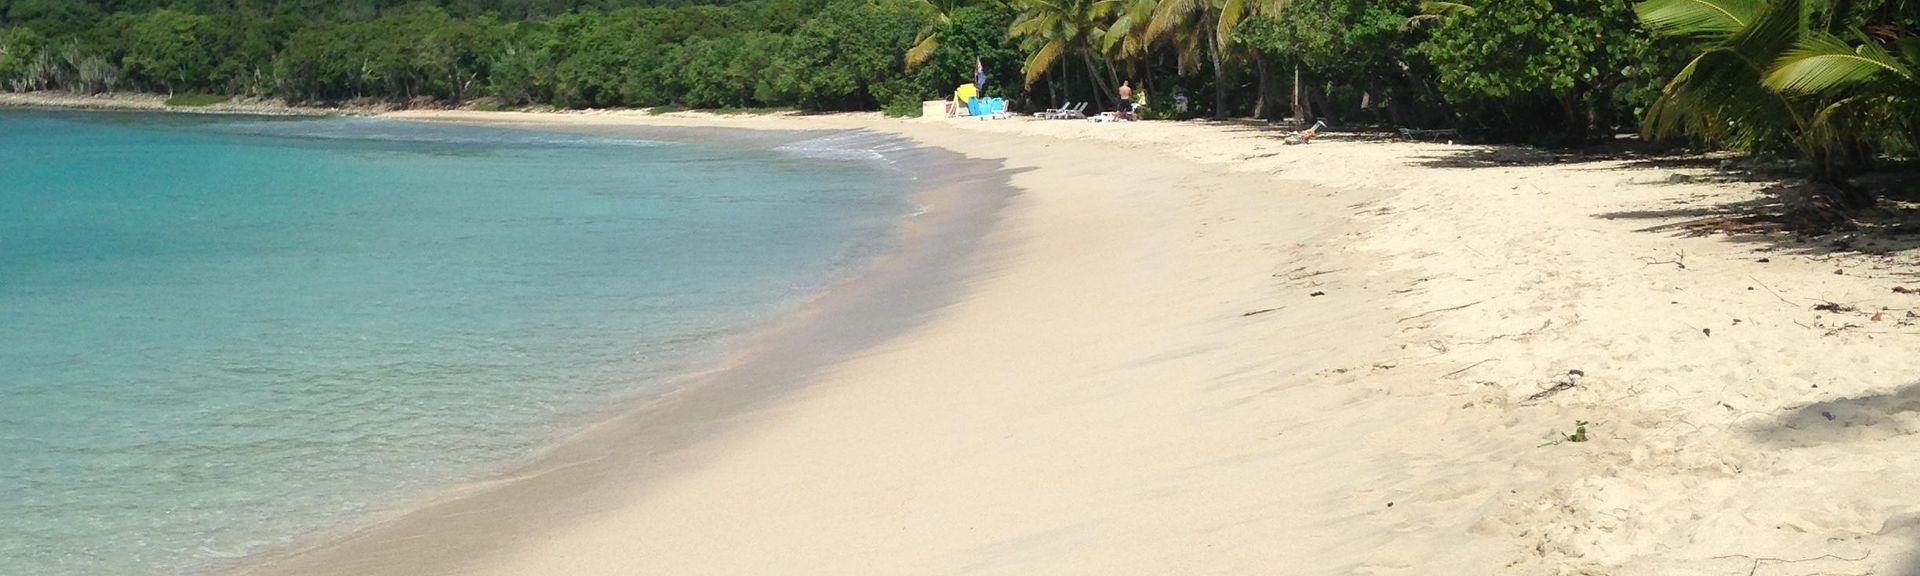 Road Town, Tortola, Britische Jungferninseln